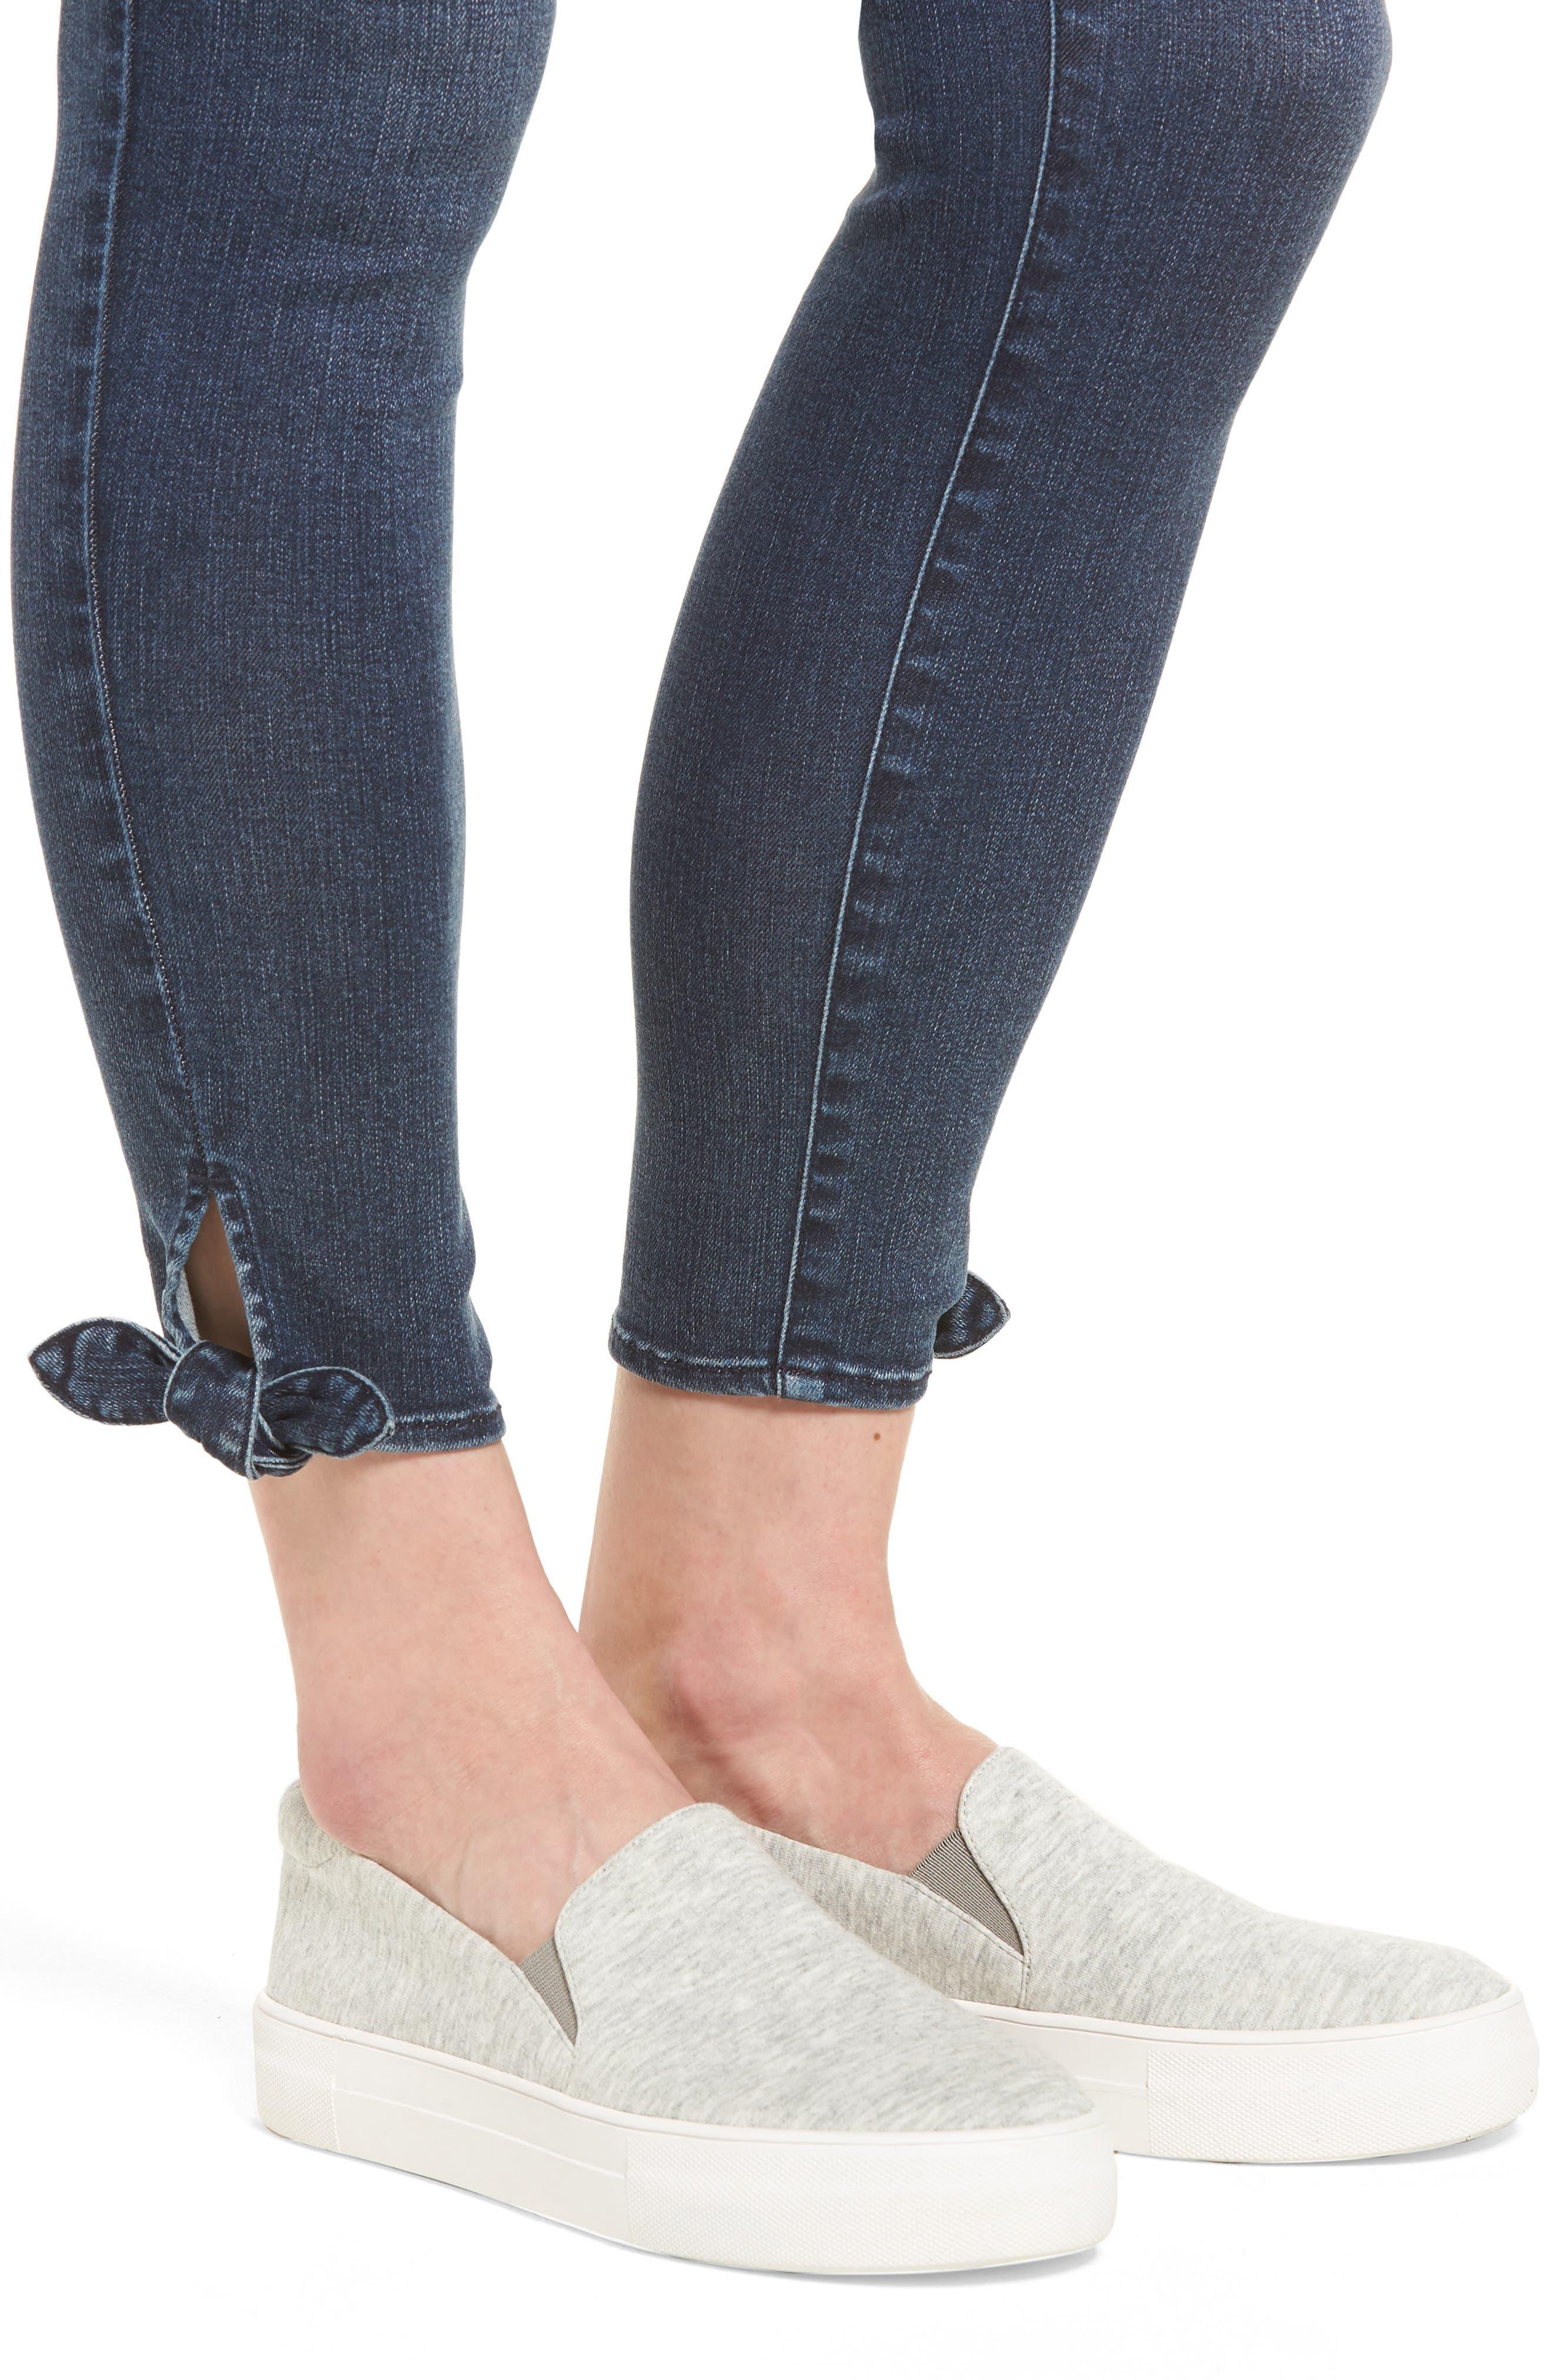 Ab-solution Ankle Skinny Skimmer Jeans,                             Alternate thumbnail 4, color,